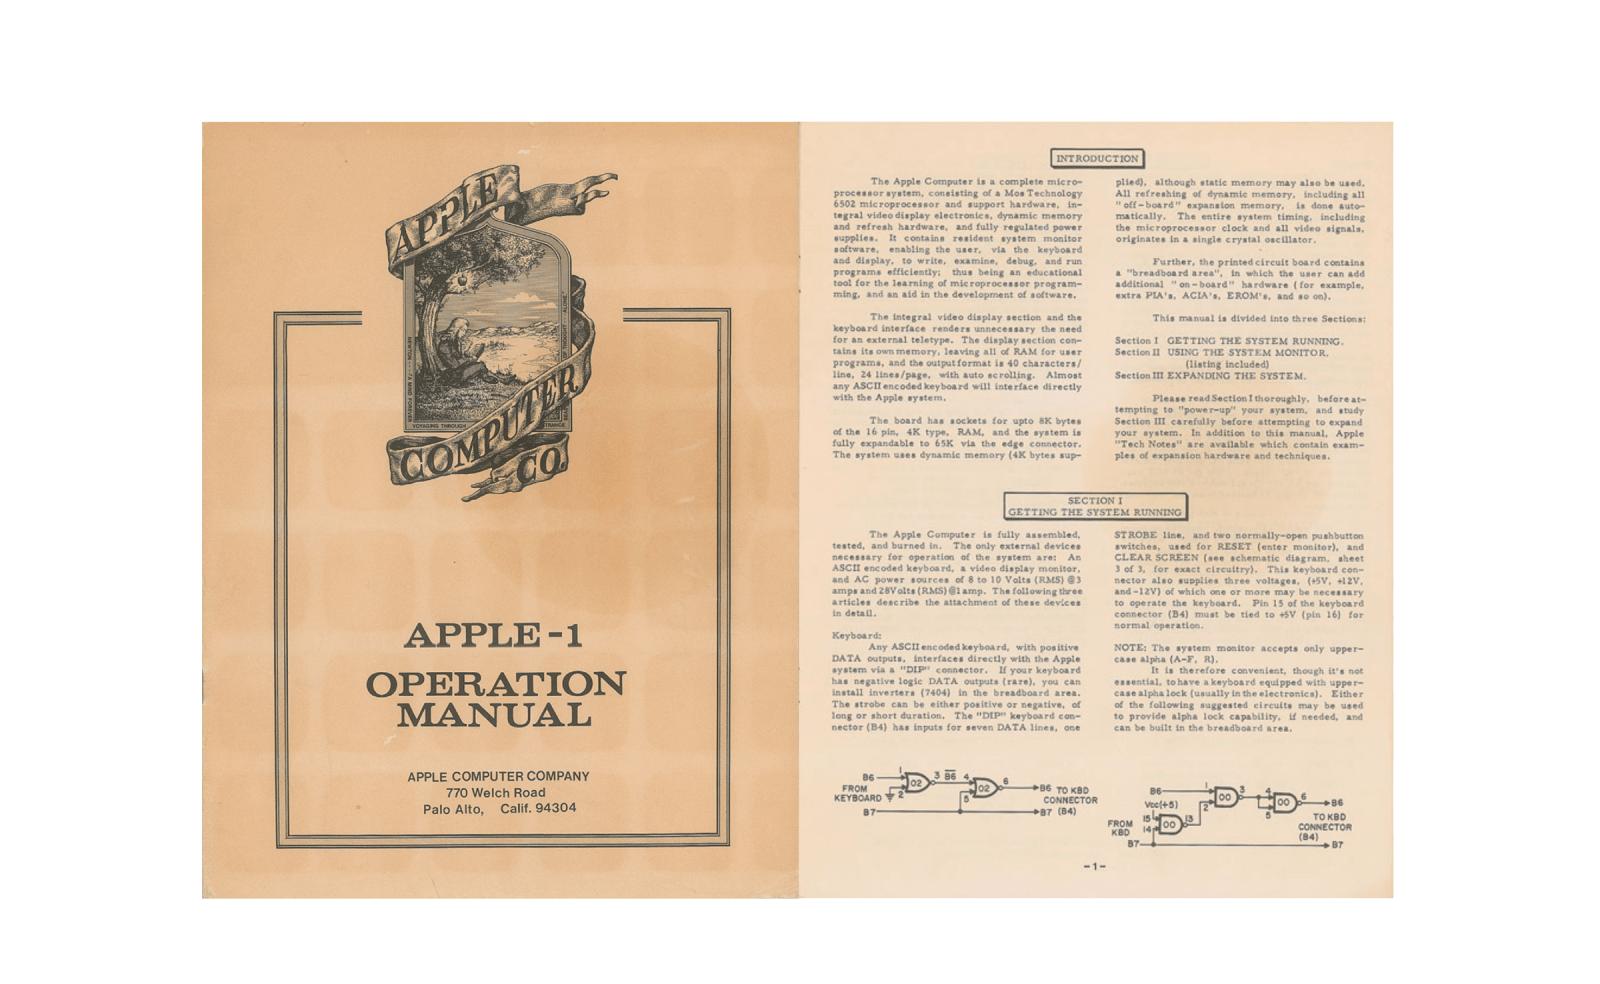 Rare Apple 1 Original Manual Up For Auction 9to5mac